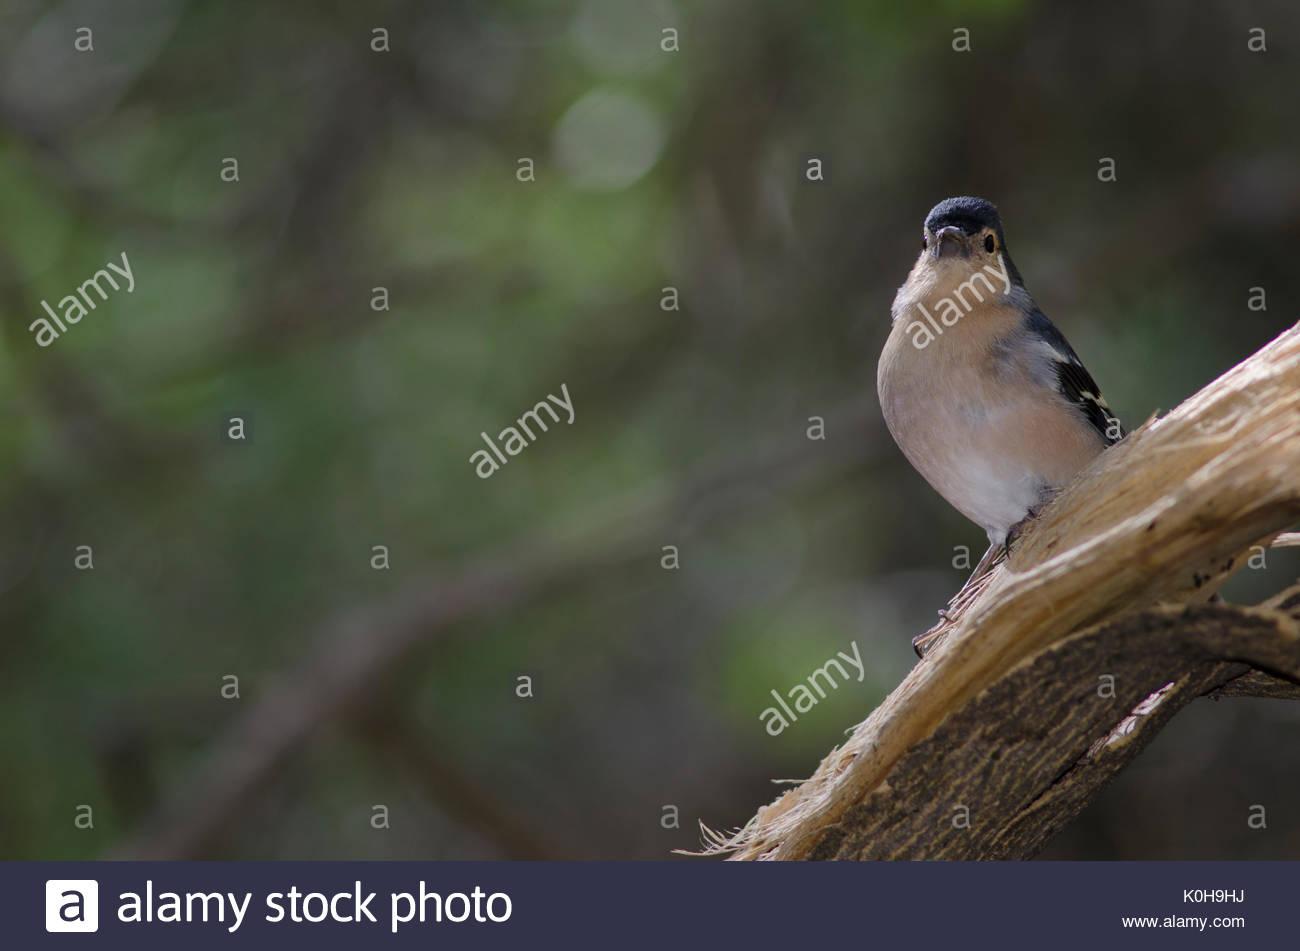 Common chaffinch (Fringilla coelebs teneriffae). Adult male. The Nublo Rural Park. Tejeda. Gran Canaria. Canary Islands. Spain. - Stock Image